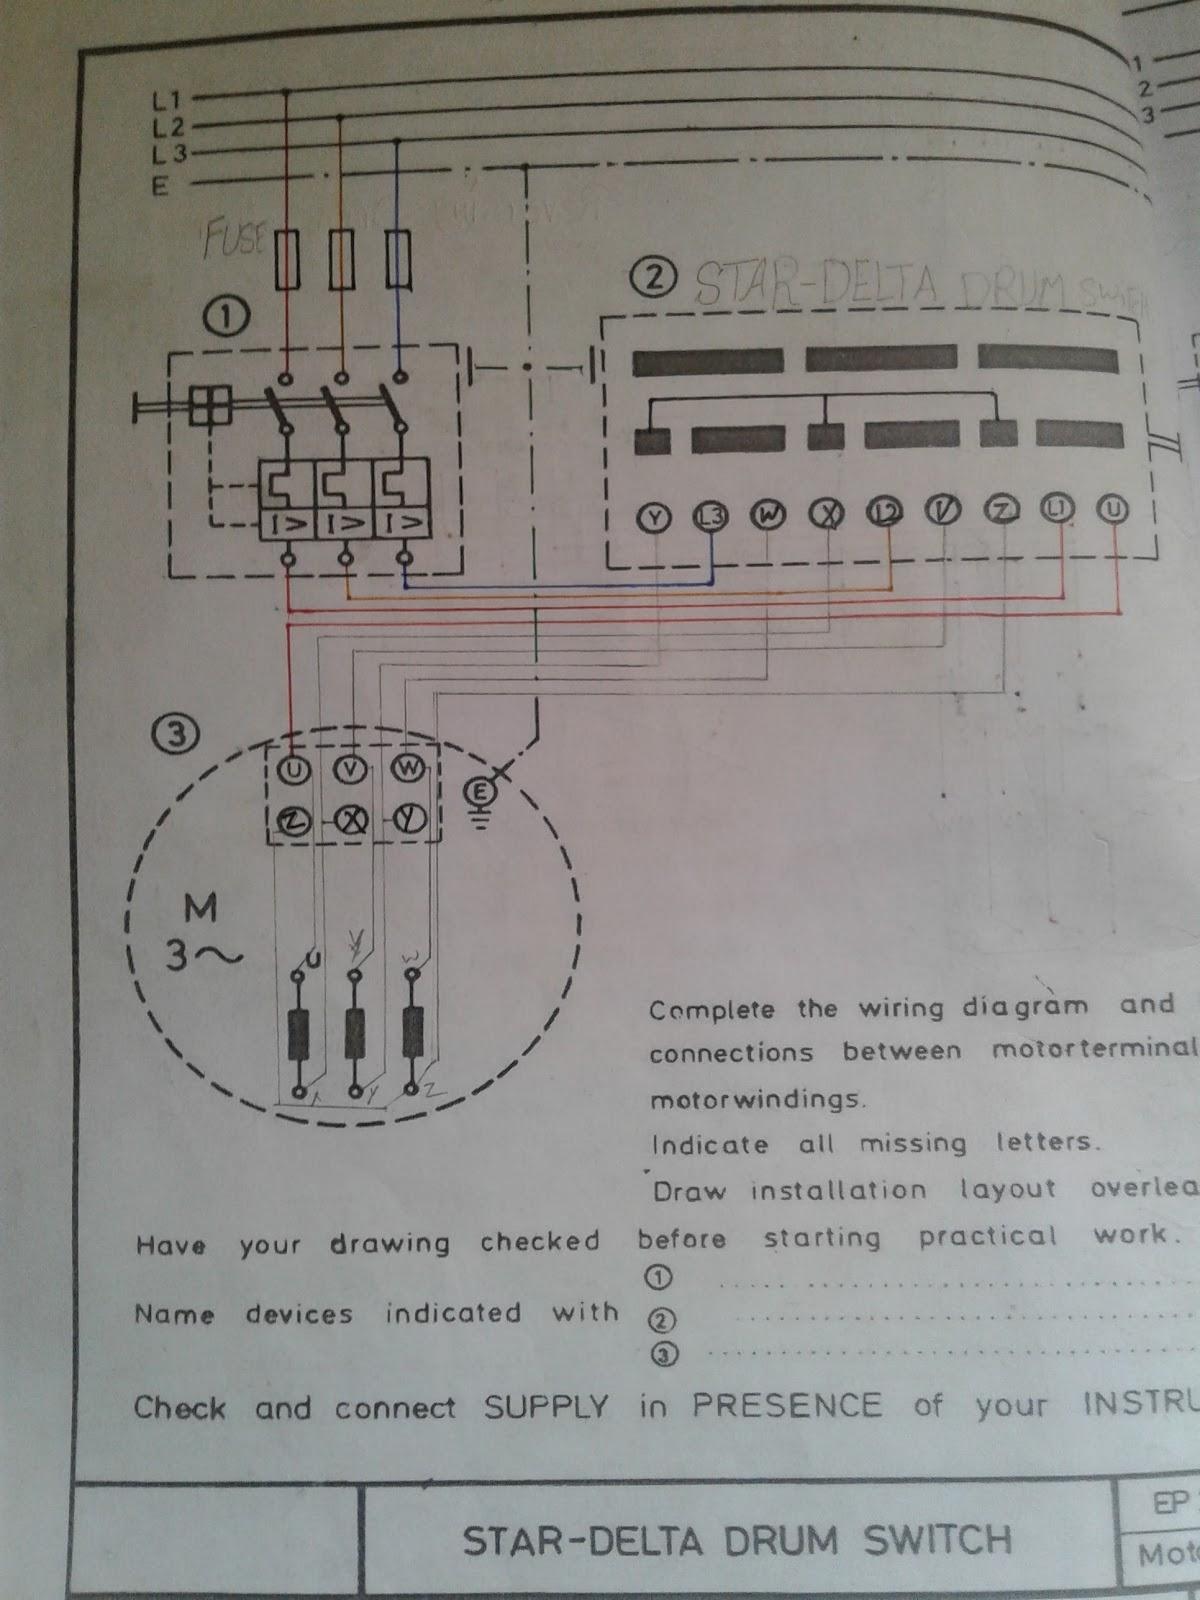 motor connection 3 star delta magnet contactor [ 1200 x 1600 Pixel ]